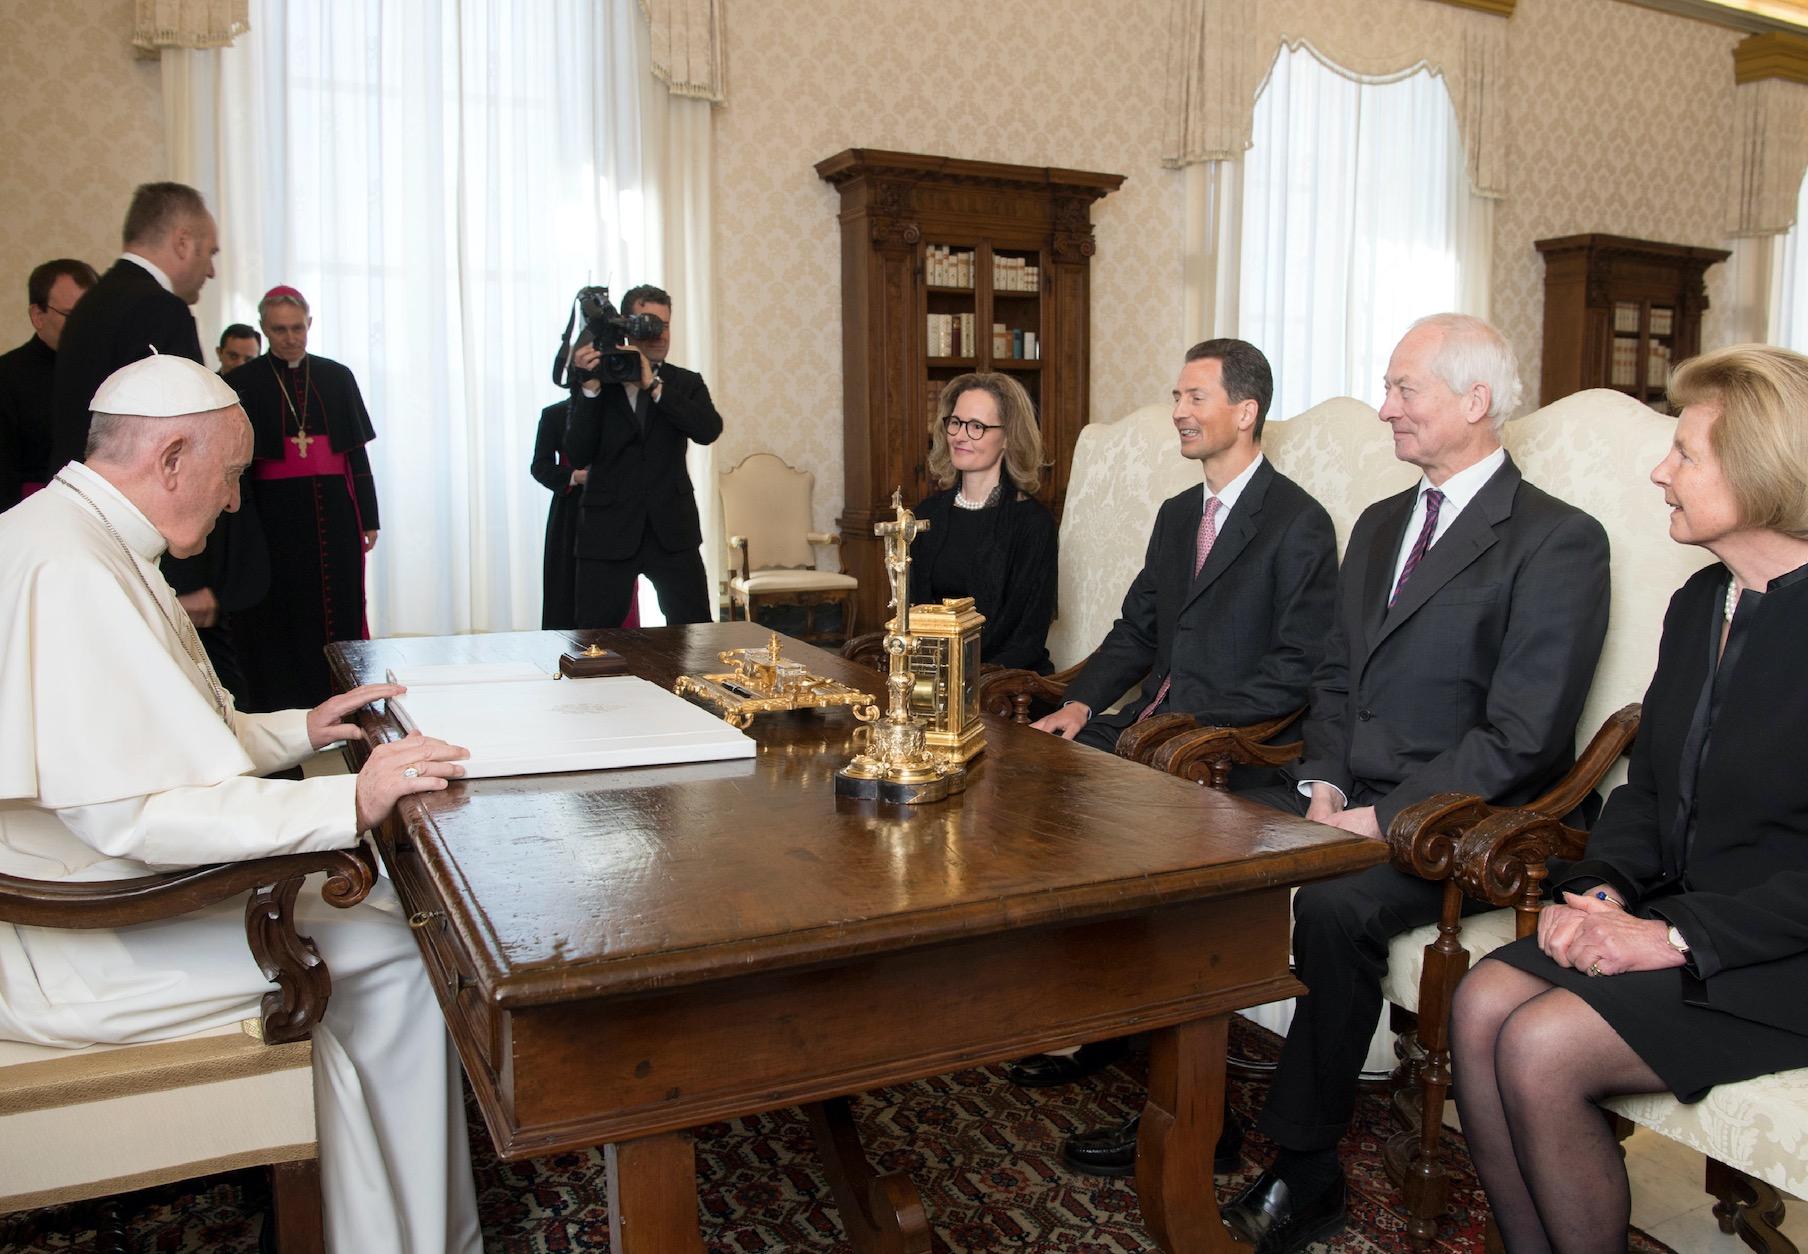 Principes de Liechtenstein (Osservatore © Romano)